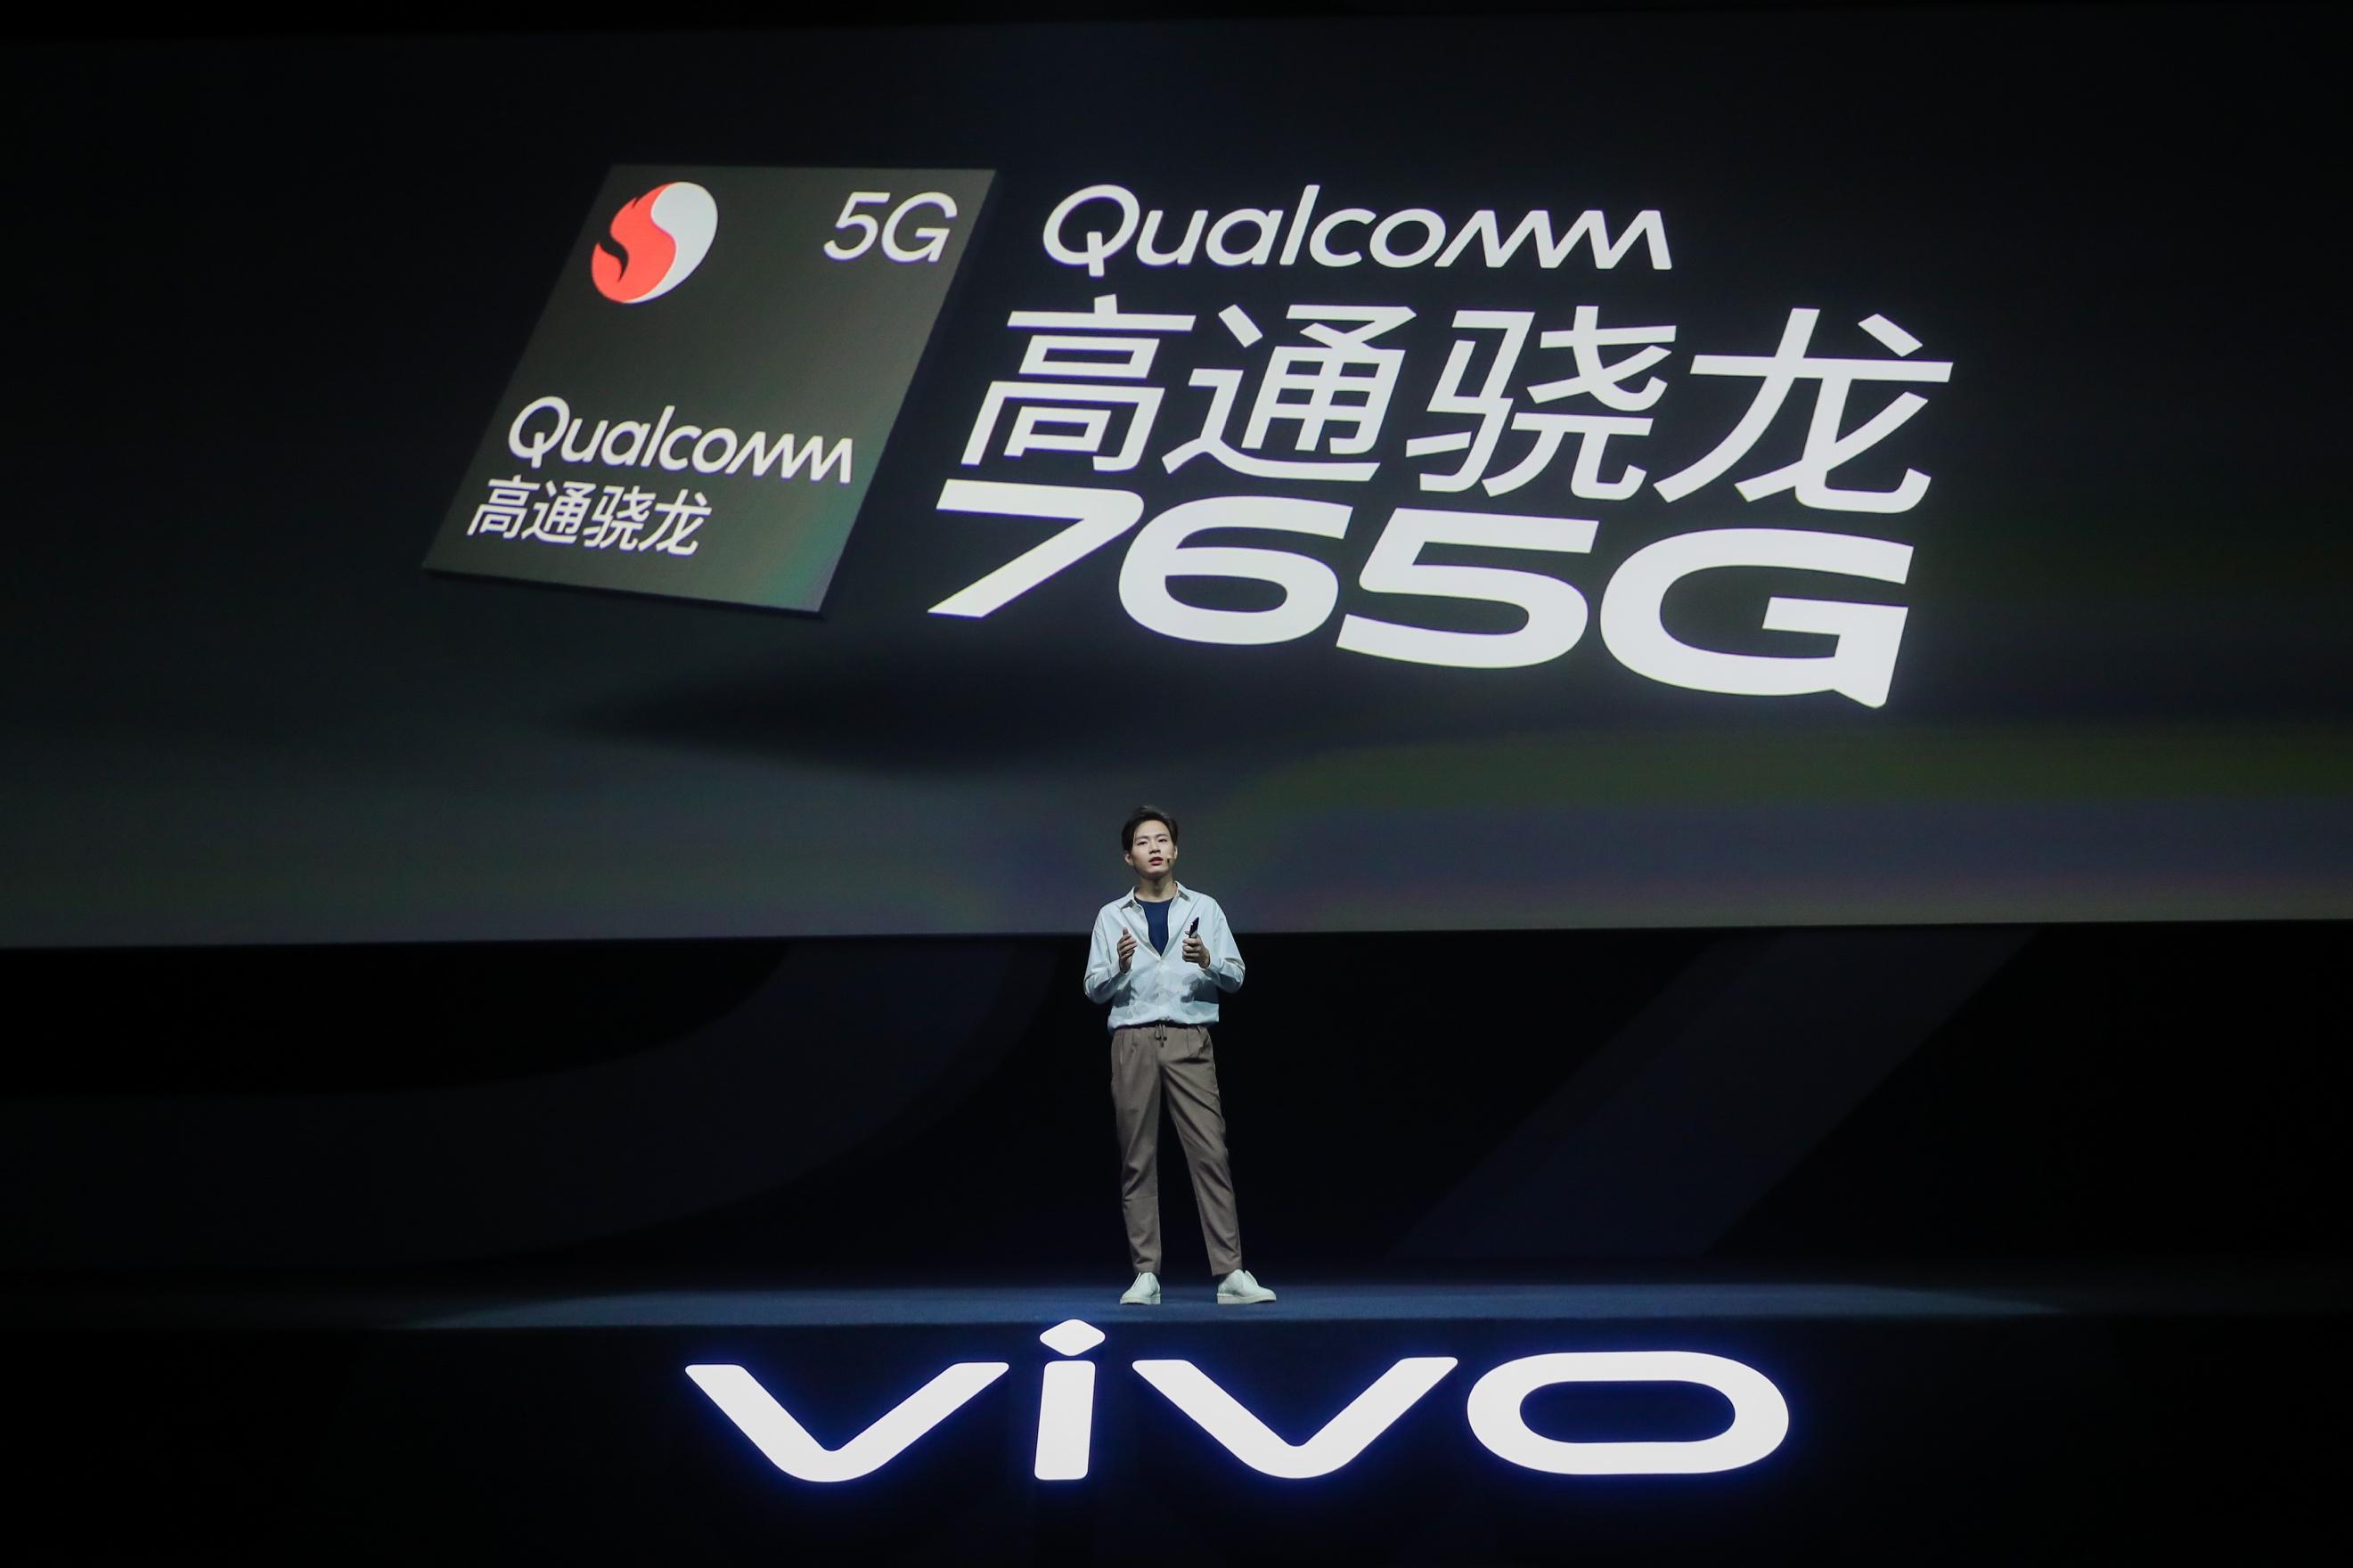 vivo S7正式发布,定位轻薄自拍旗舰,拥有全新幻彩三色